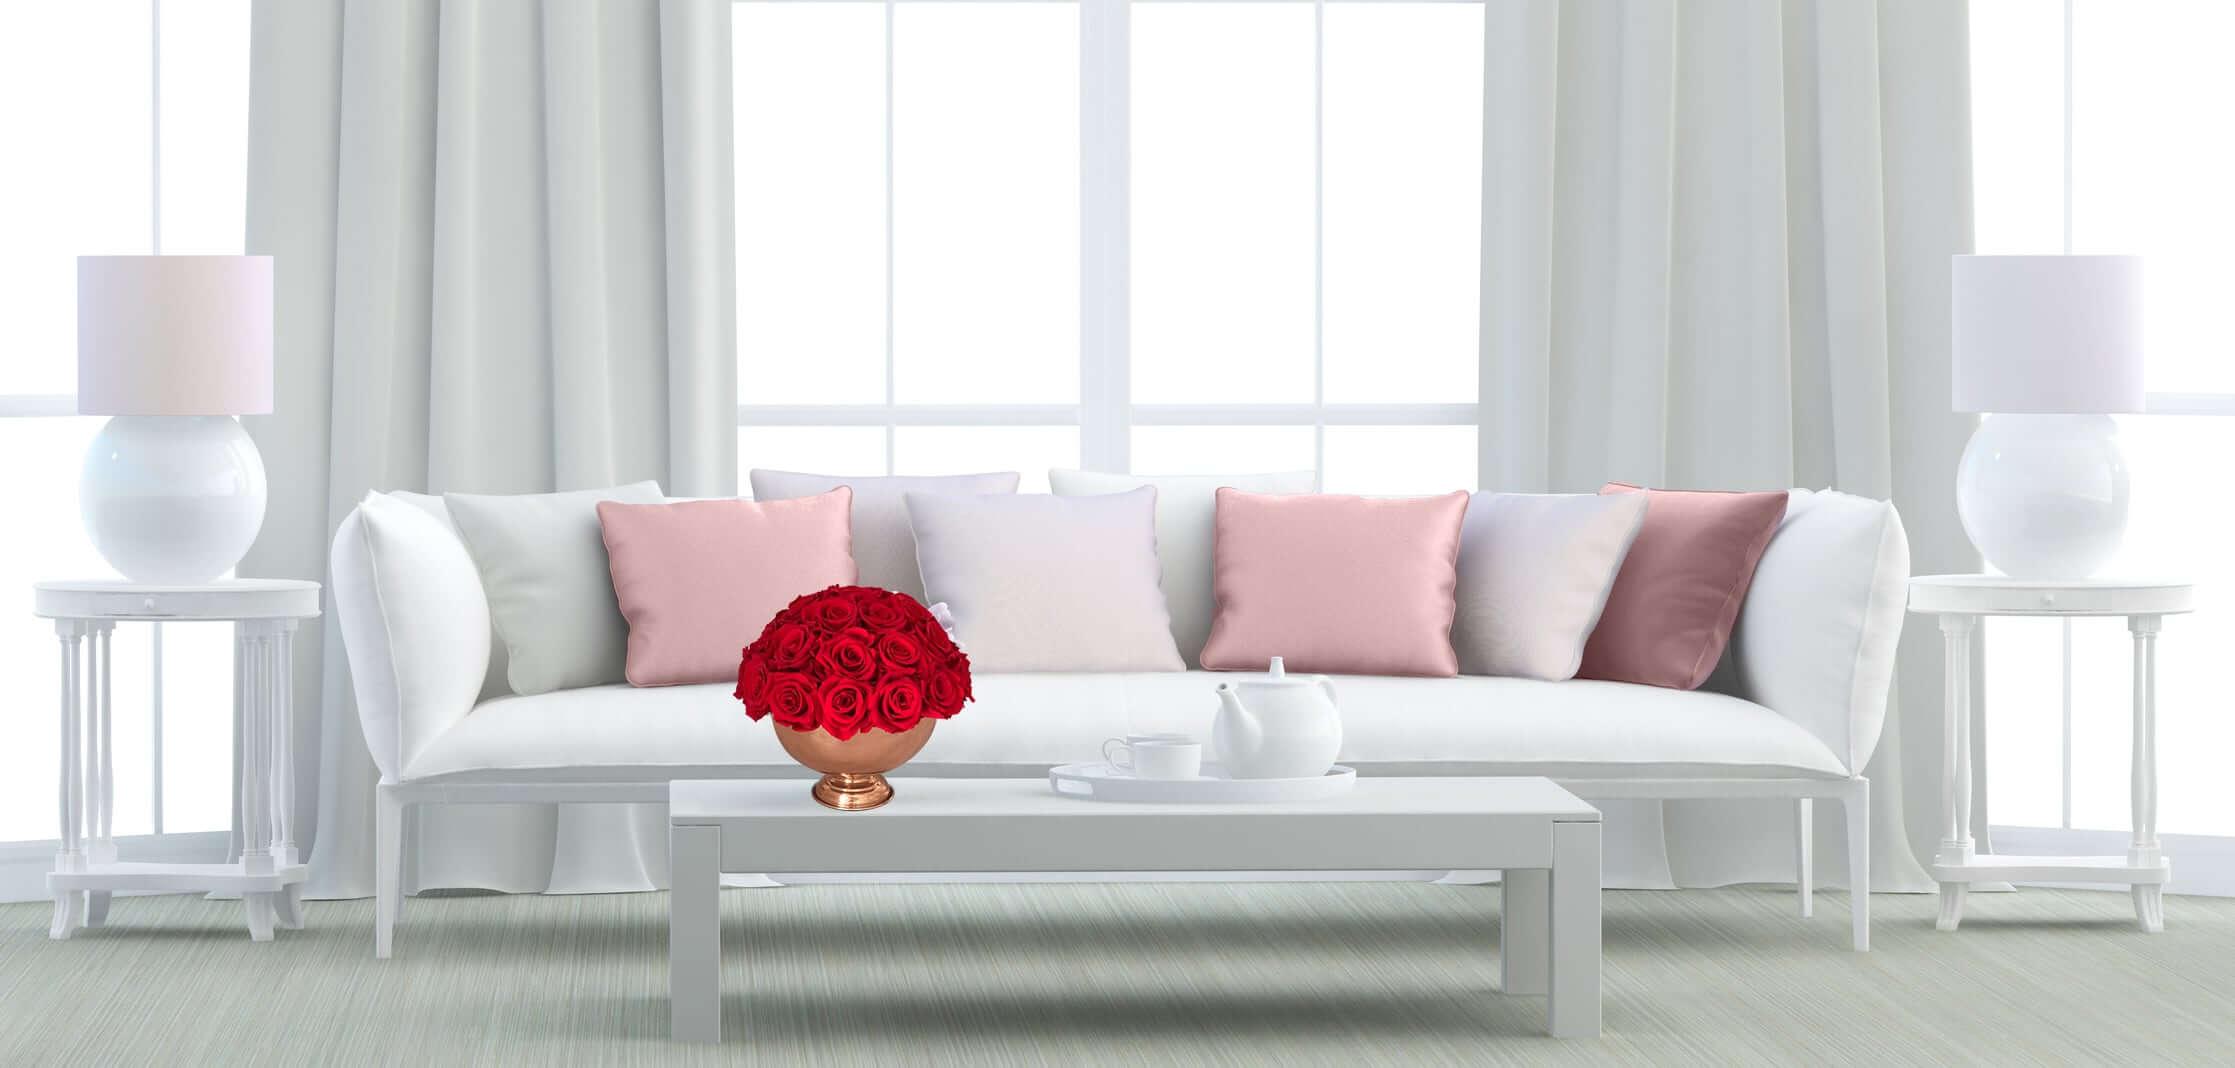 Heinau Red Roses Floral Arrangement on Table Interior